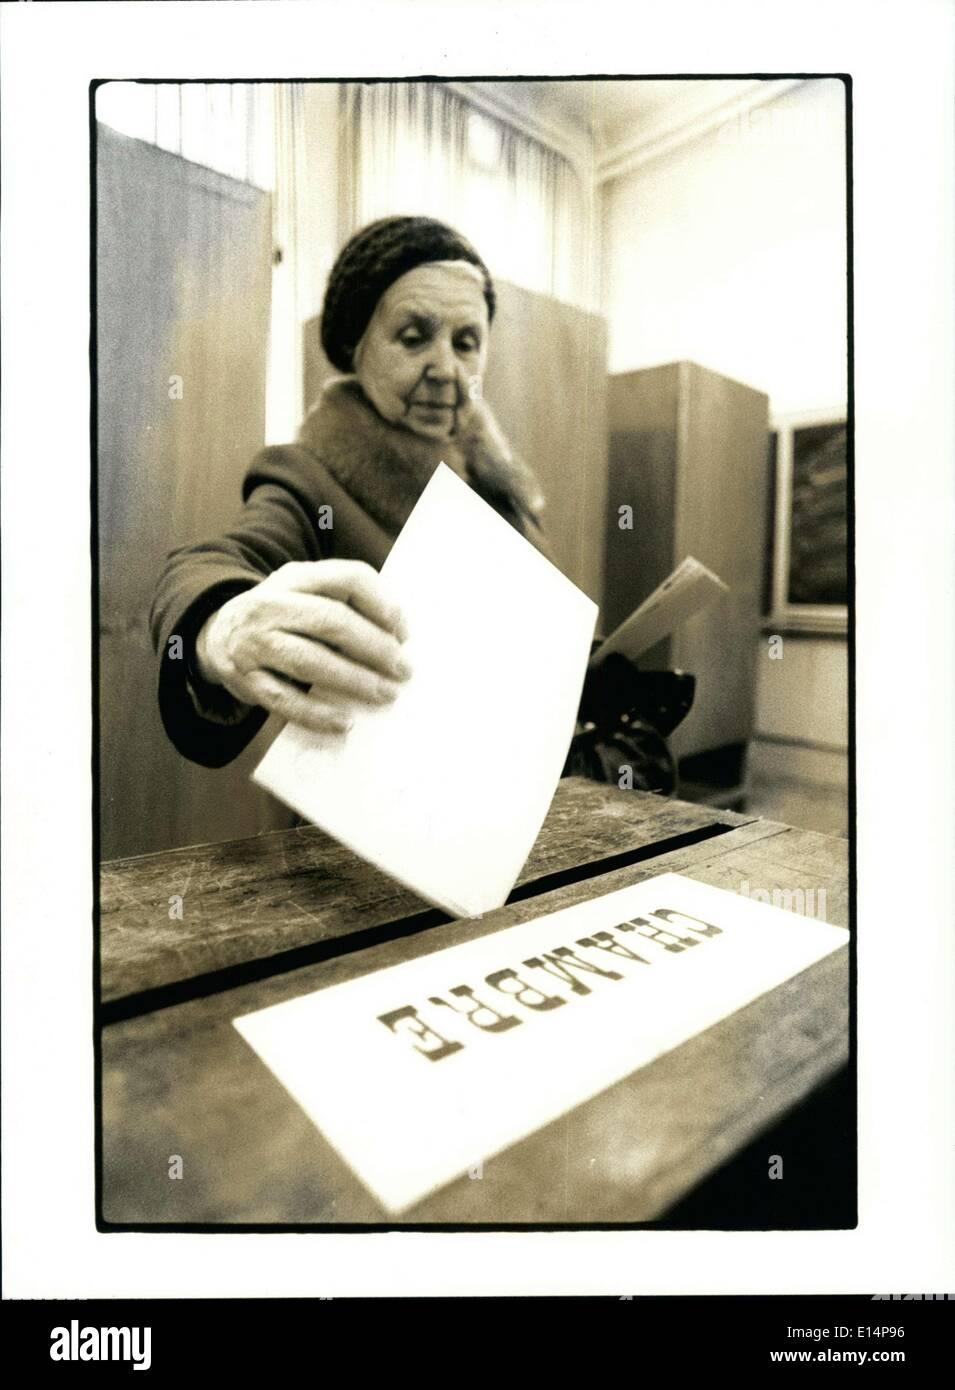 Apr. 12, 2012 - Woman Votes in Belgium's Legislative Elections - Stock Image